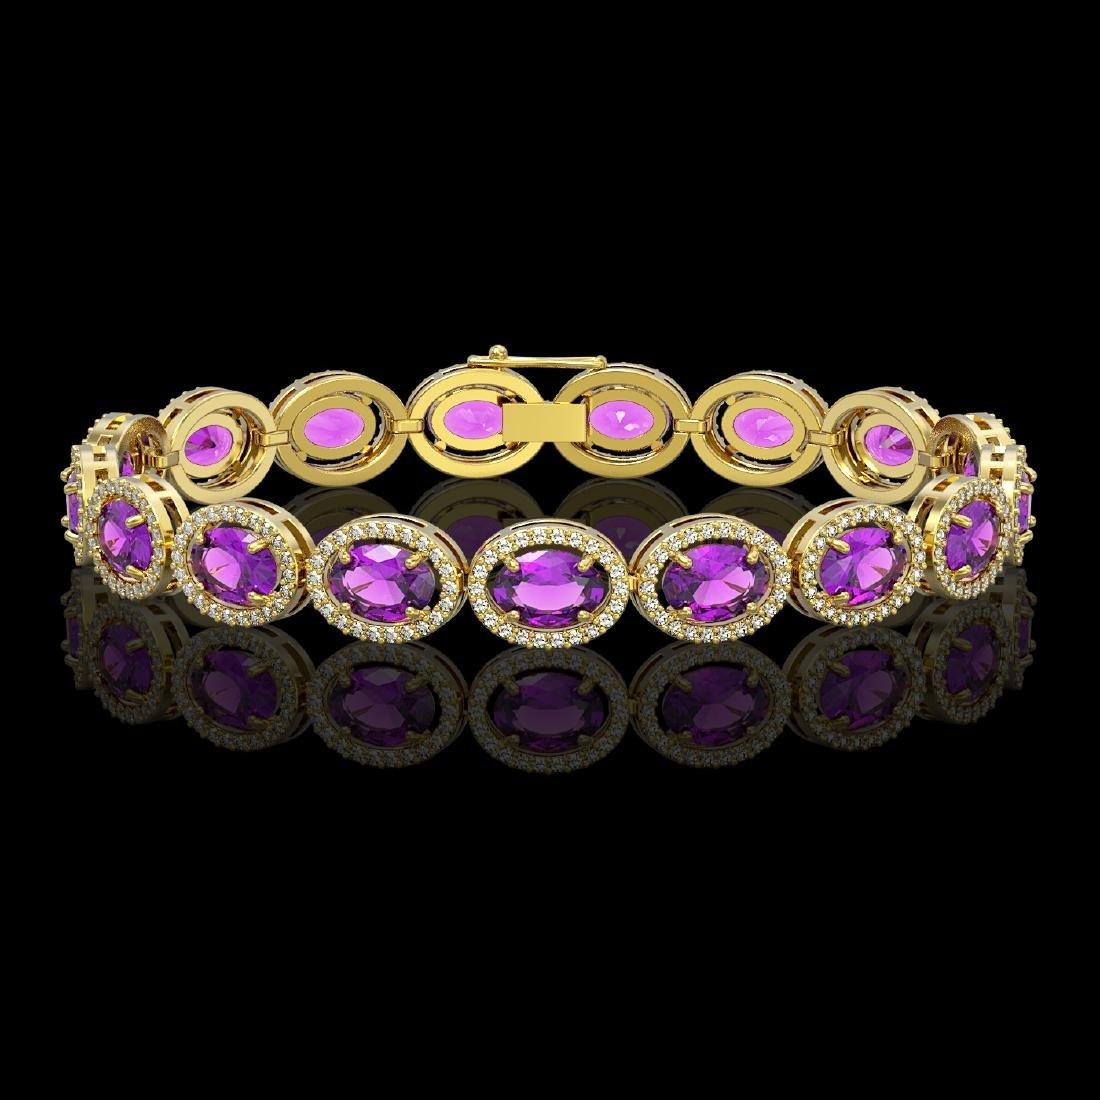 19.82 CTW Amethyst & Diamond Halo Bracelet 10K Yellow